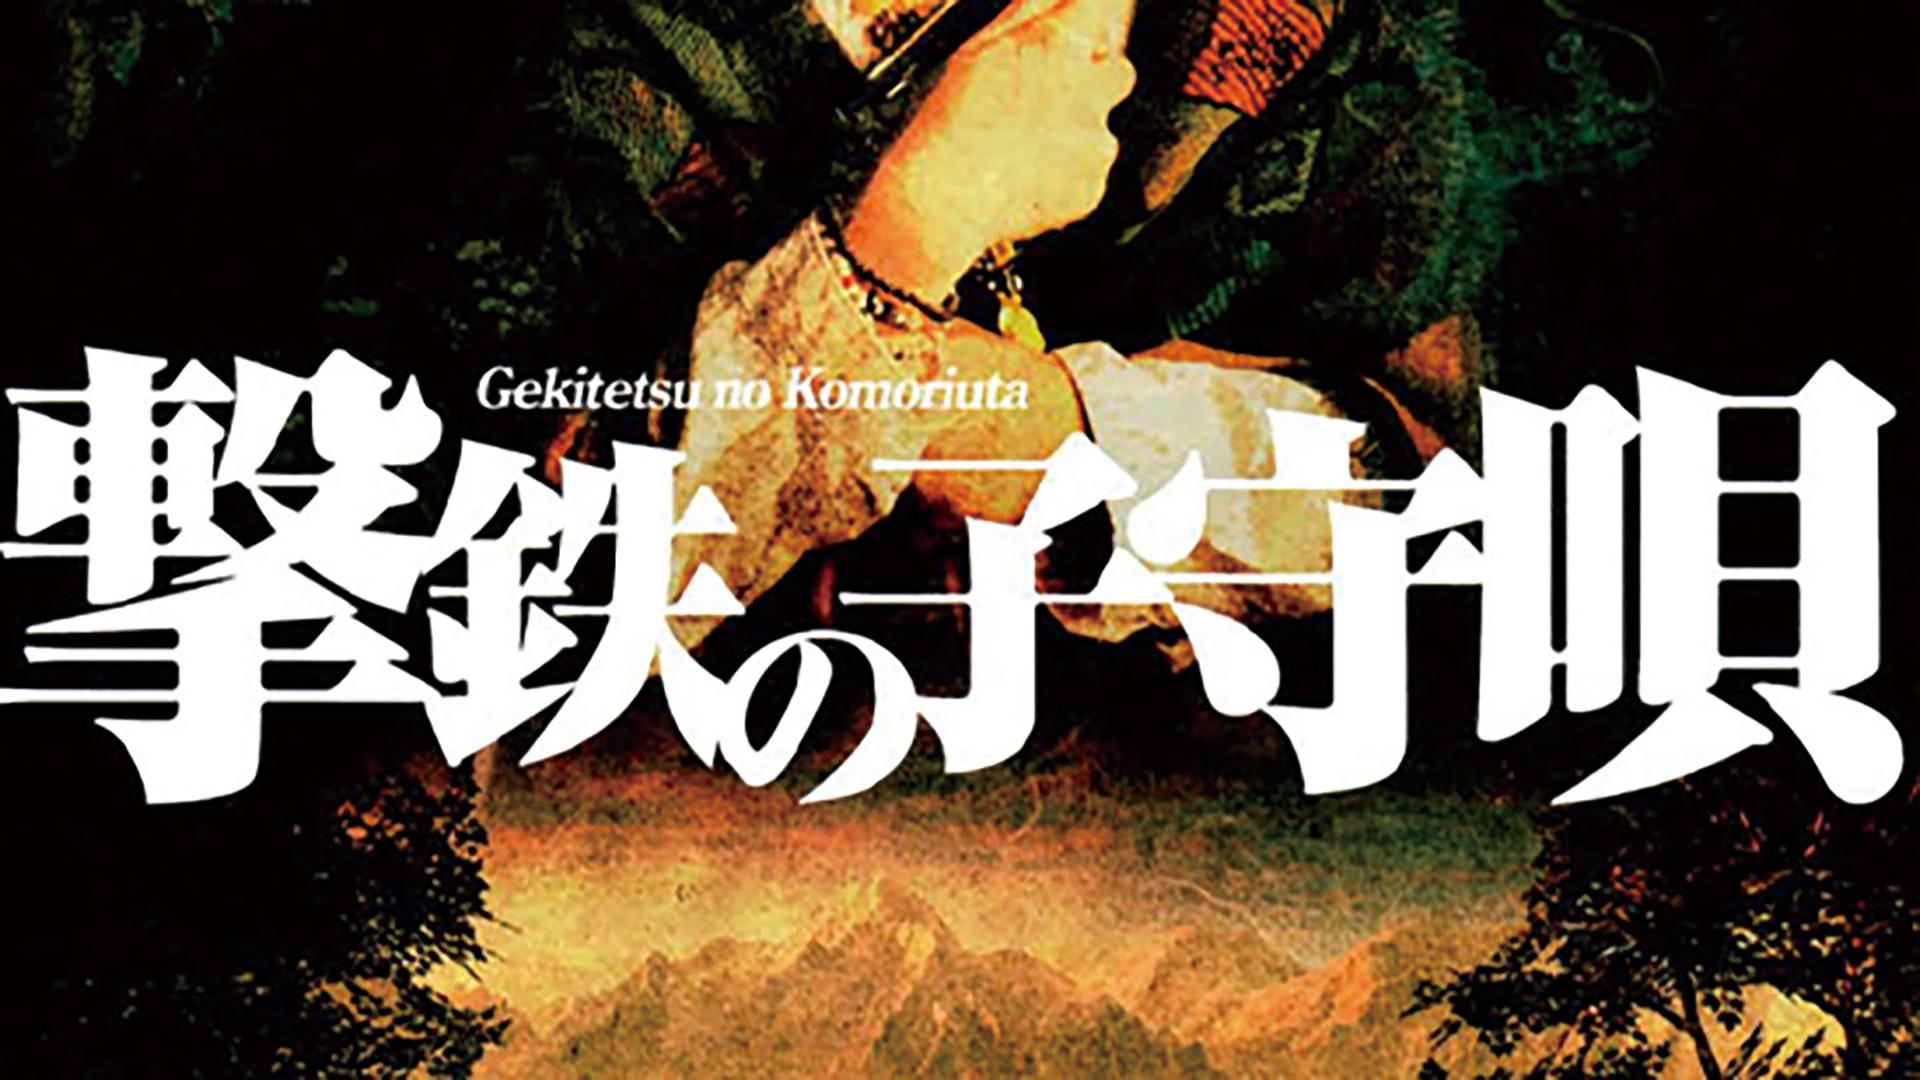 撃鉄の子守唄 2007年初演